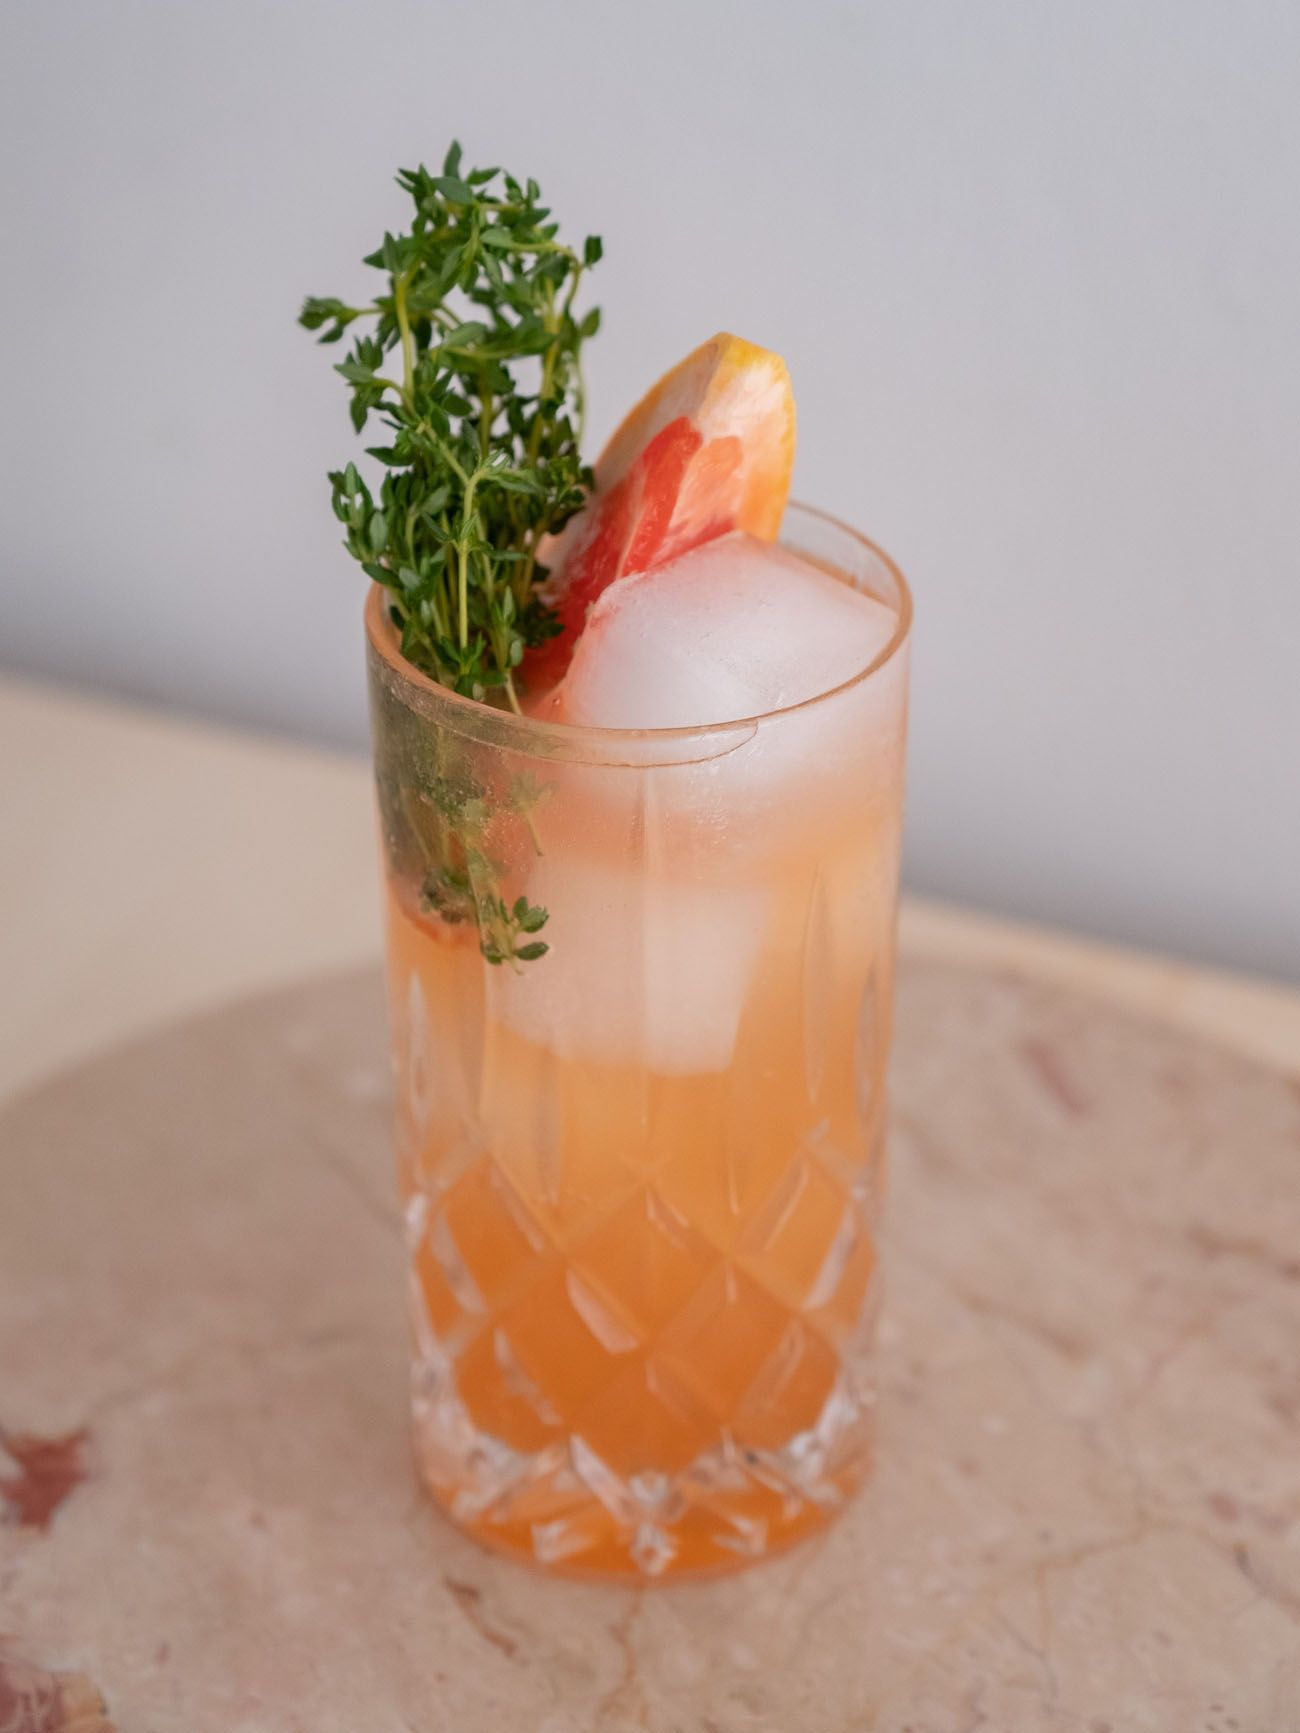 Foodblog, About Fuel, Soda Stream, Sirup, Rezept, Pink Grapefruit mit Thymian, Limonade, Glas, Drink